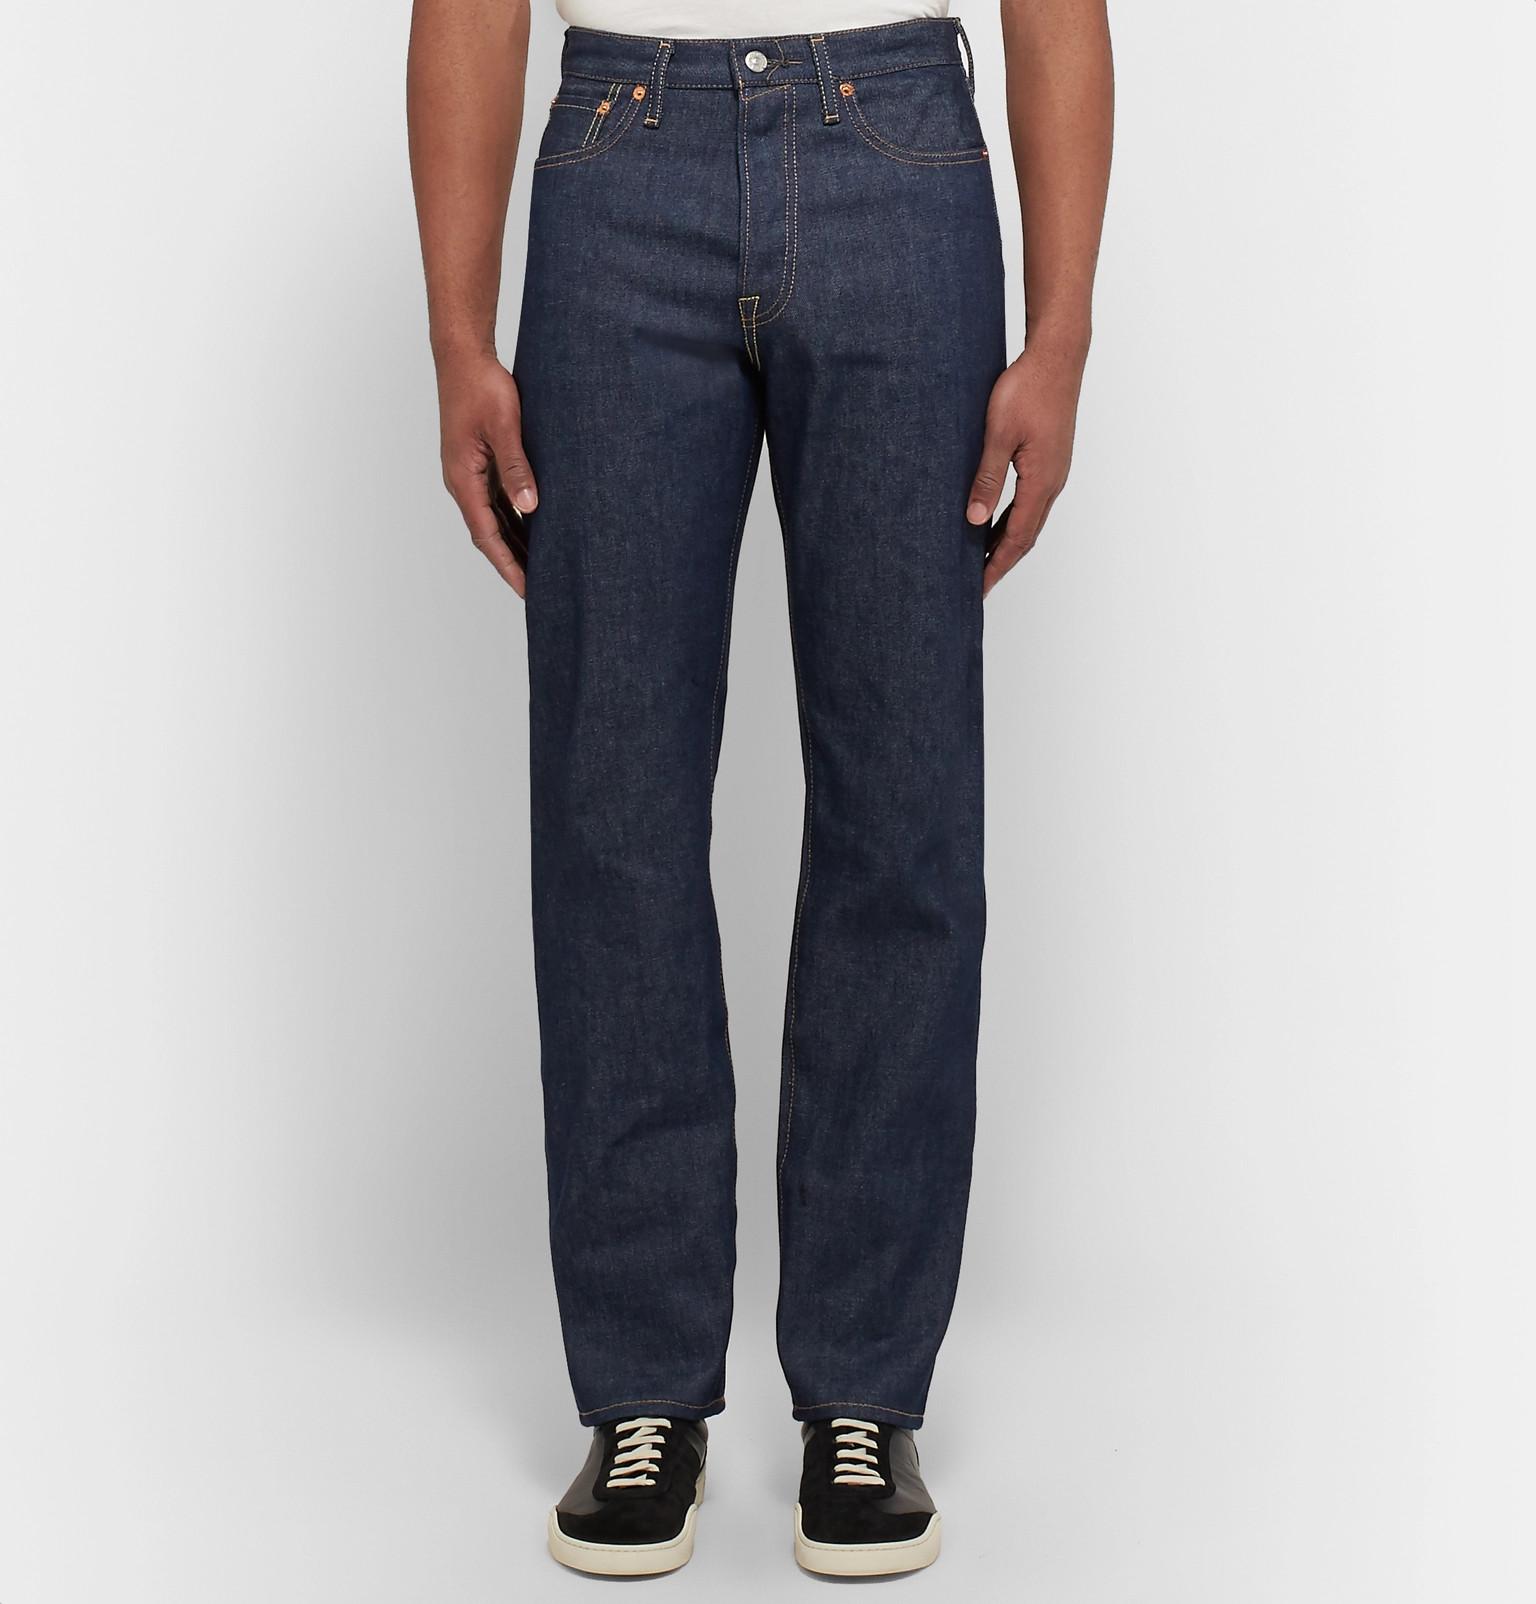 0f9afd68e34 Acne Studios - 1996 Rigid Denim Jeans